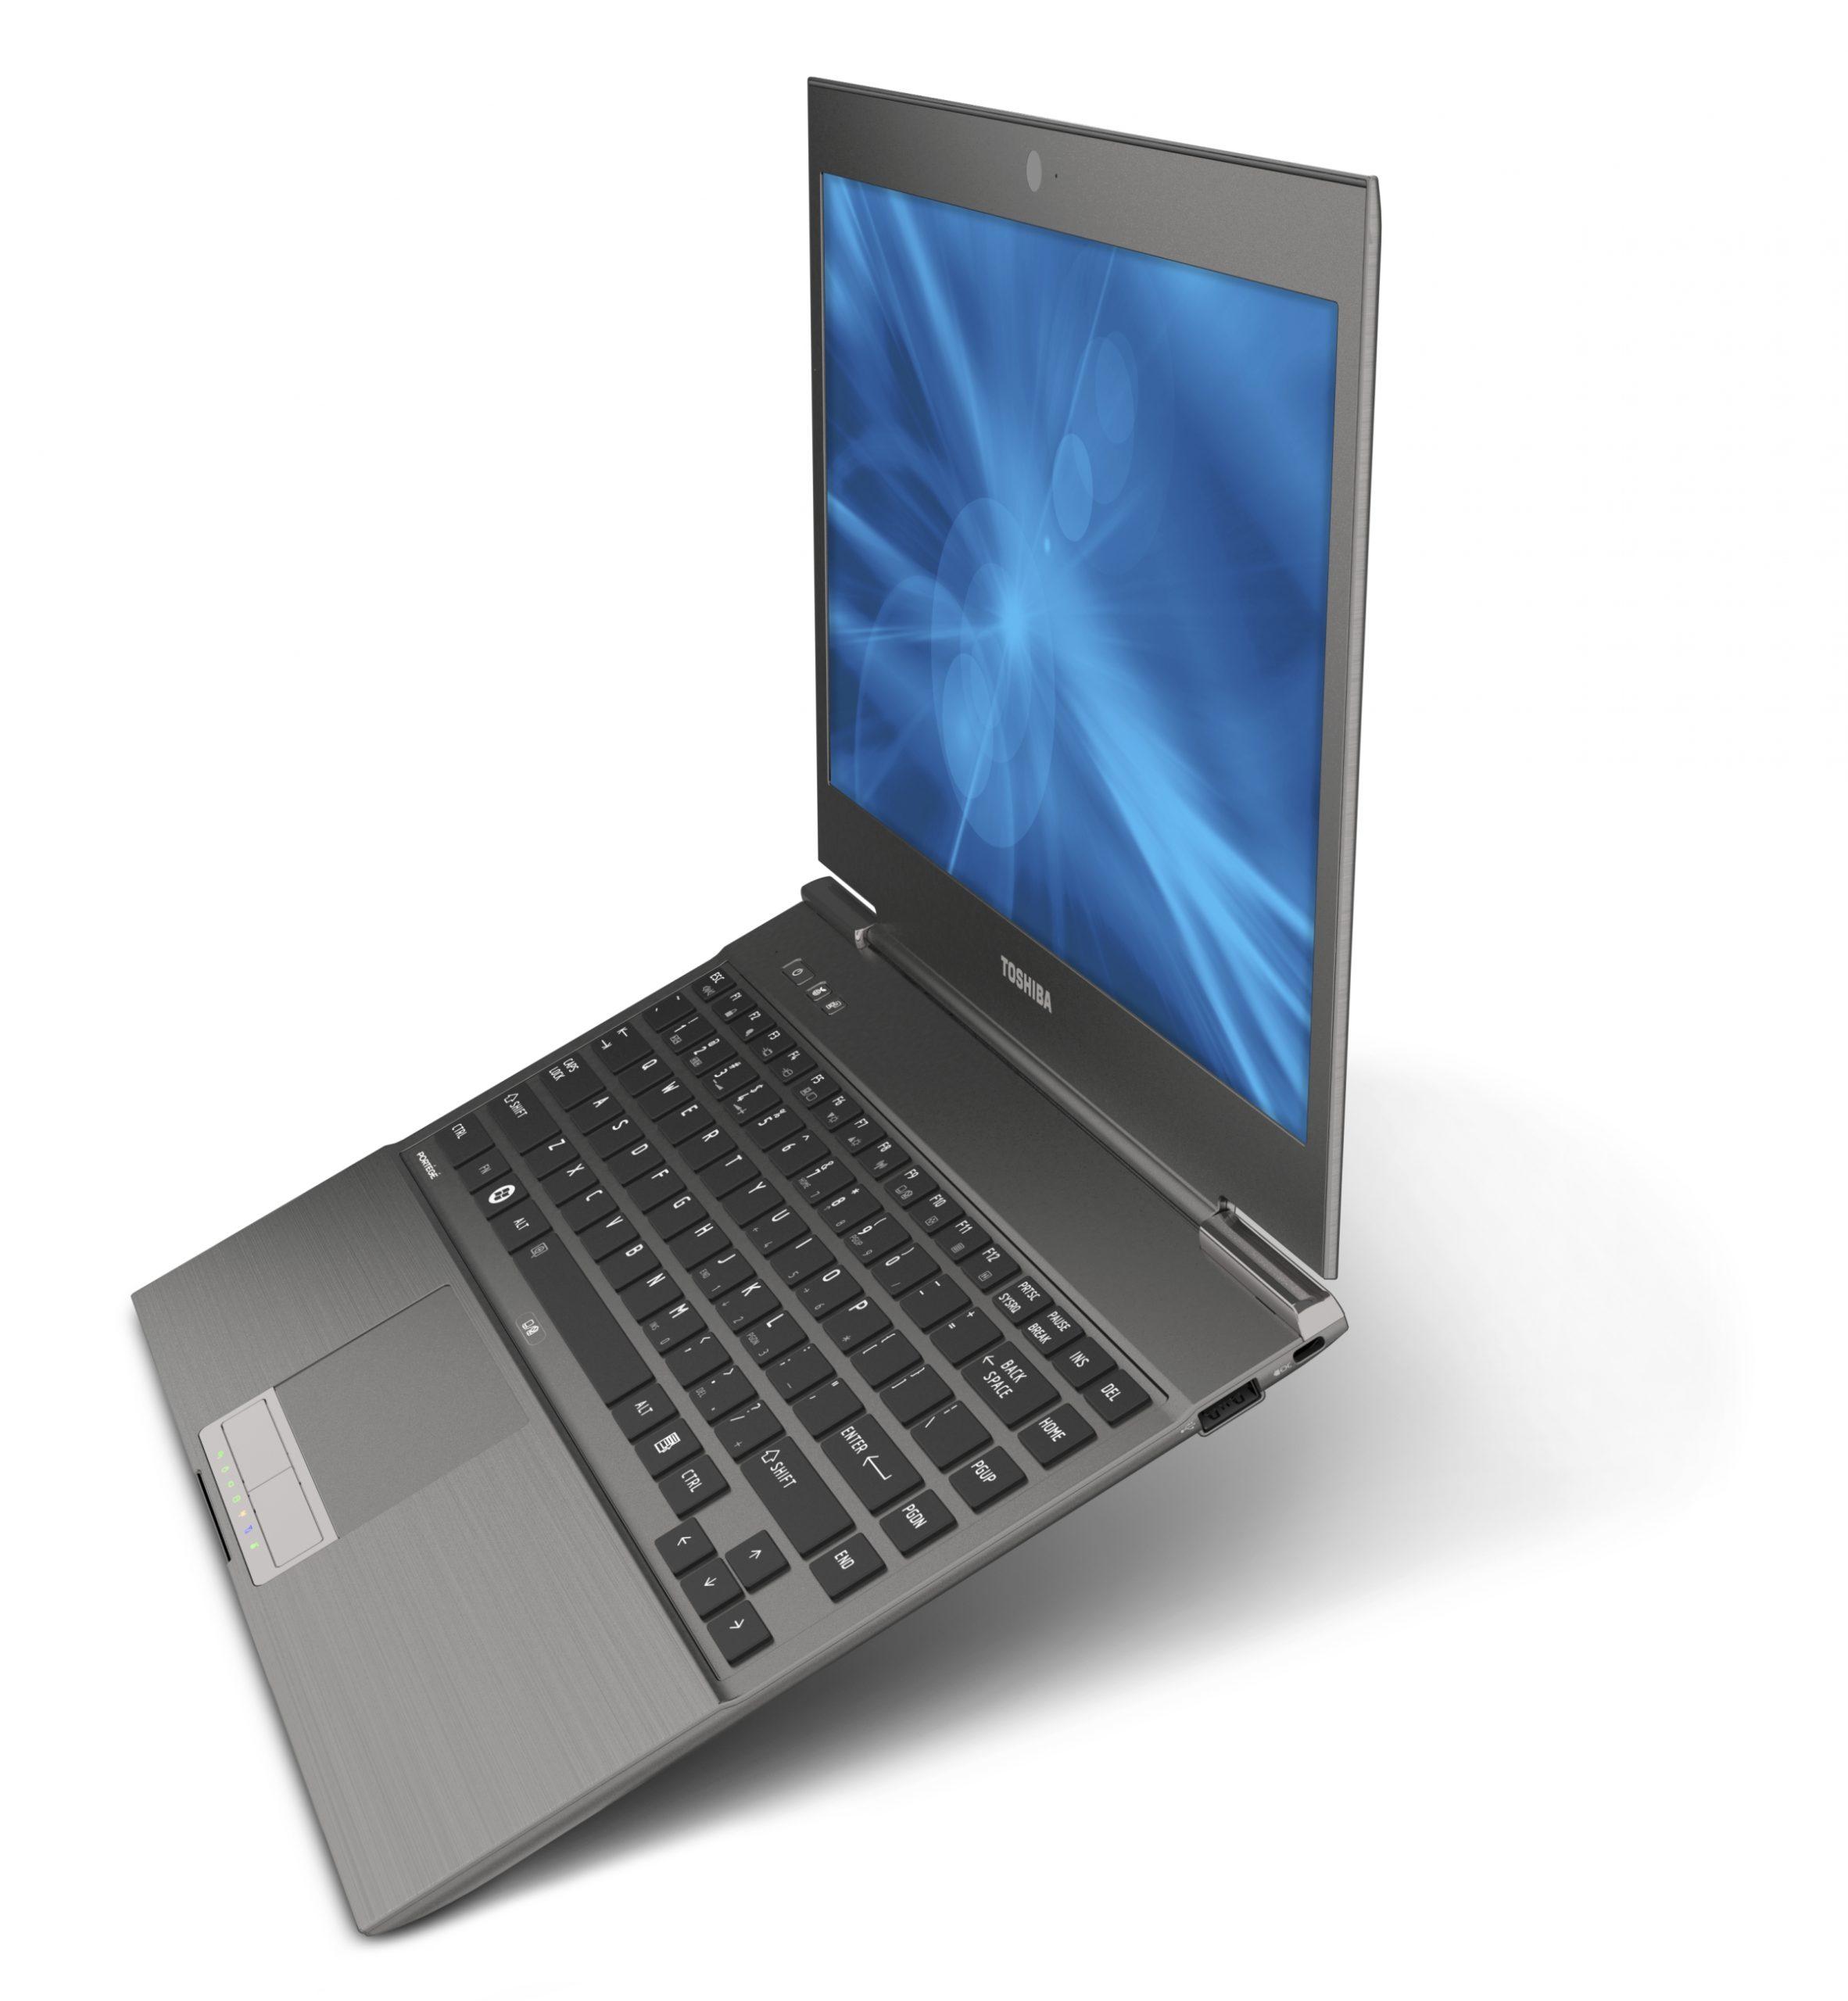 Toshiba Unveils Portege Z830 Ultrabook Series